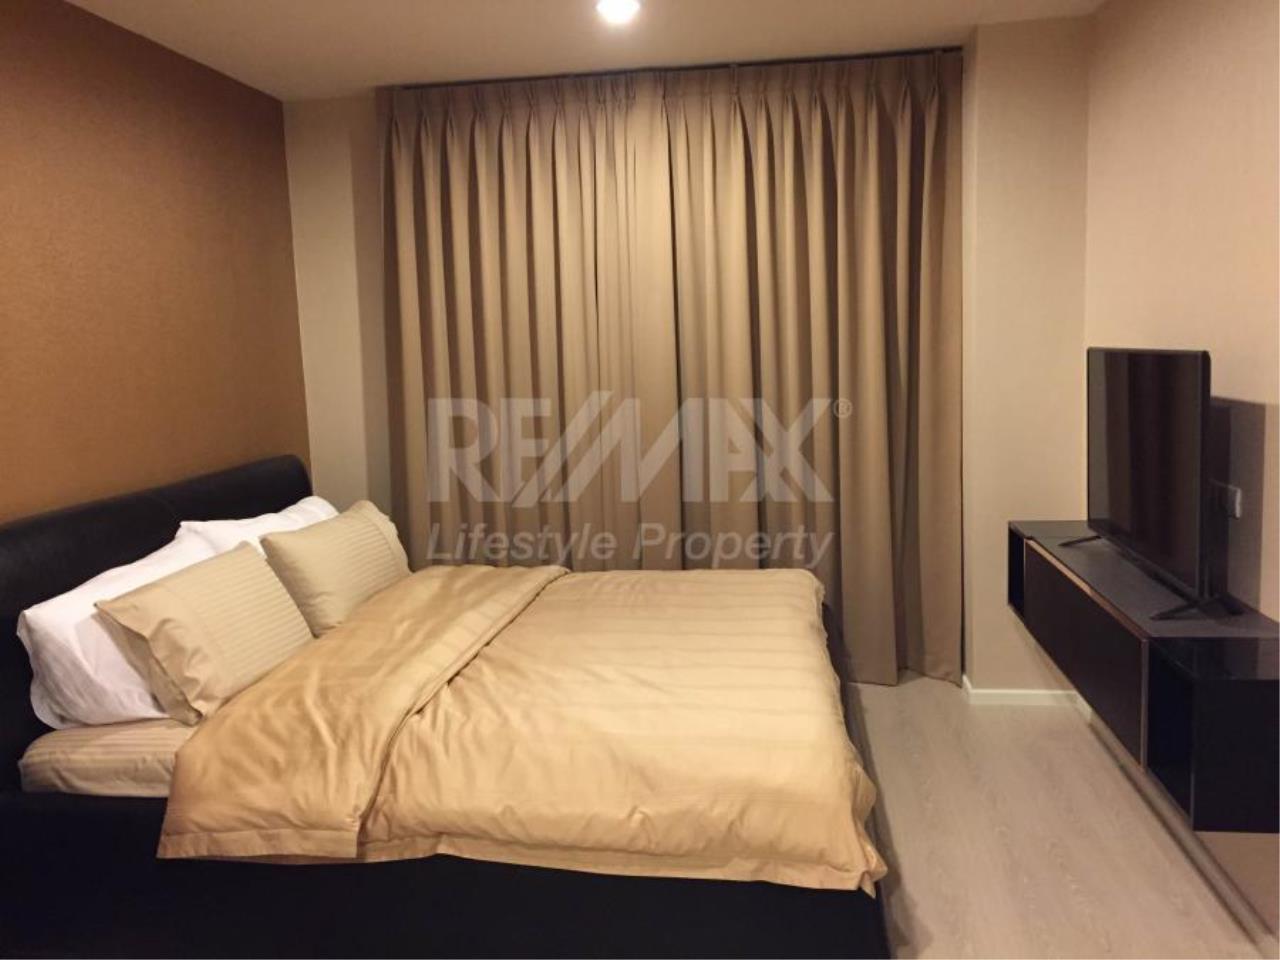 RE/MAX LifeStyle Property Agency's Rhythm Sathorn - Narathiwas 3